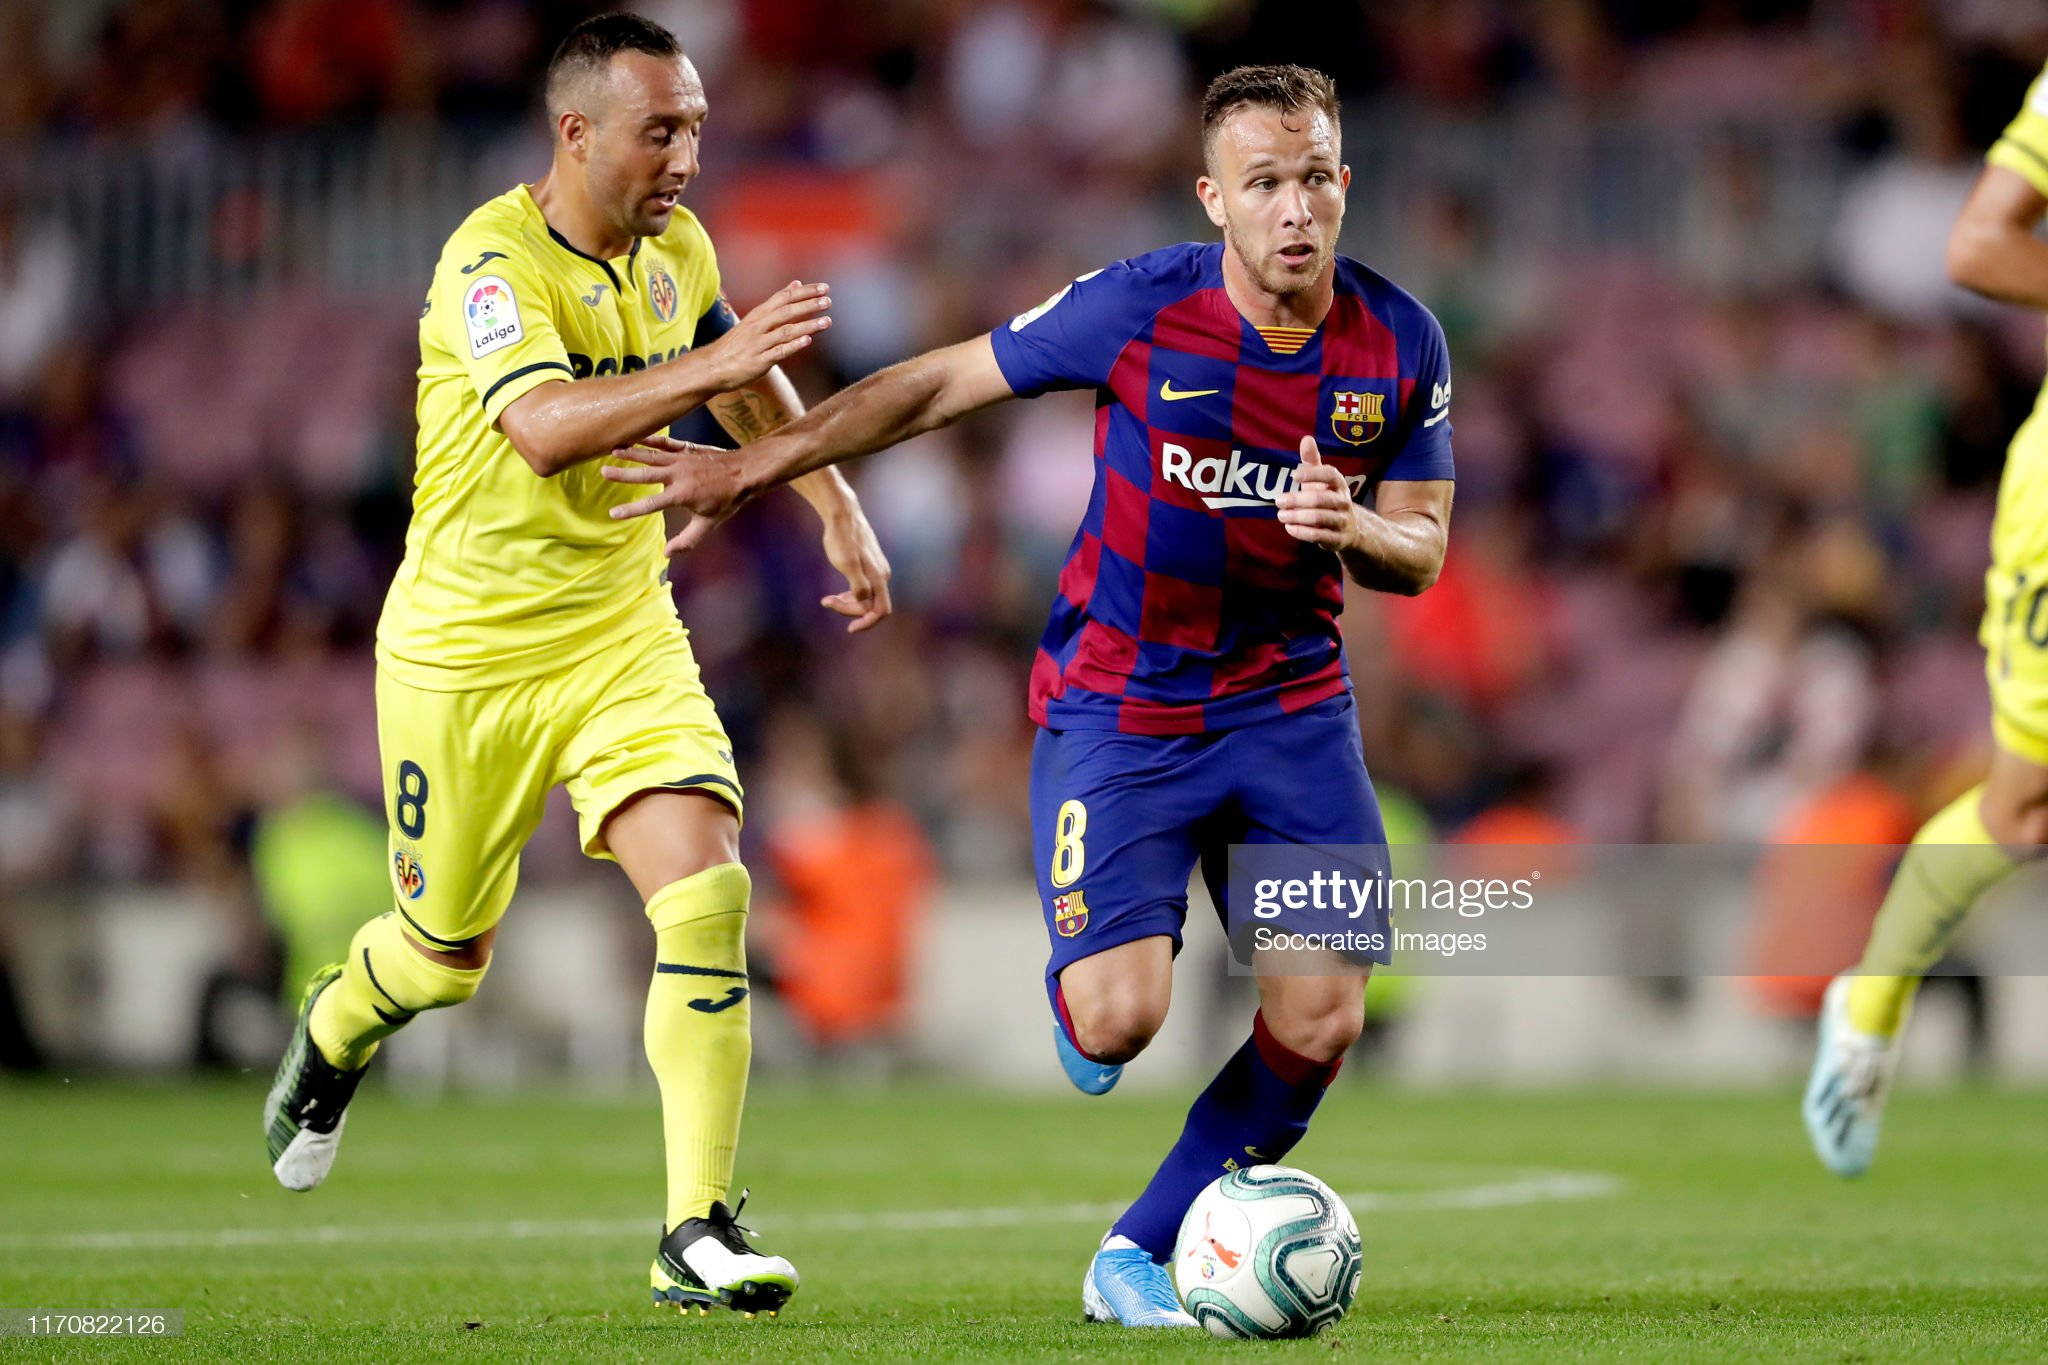 صور مباراة : برشلونة - فياريال 2-1 ( 24-09-2019 )  Santi-cazorla-of-villarreal-arthur-of-fc-barcelona-during-the-la-liga-picture-id1170822126?s=2048x2048